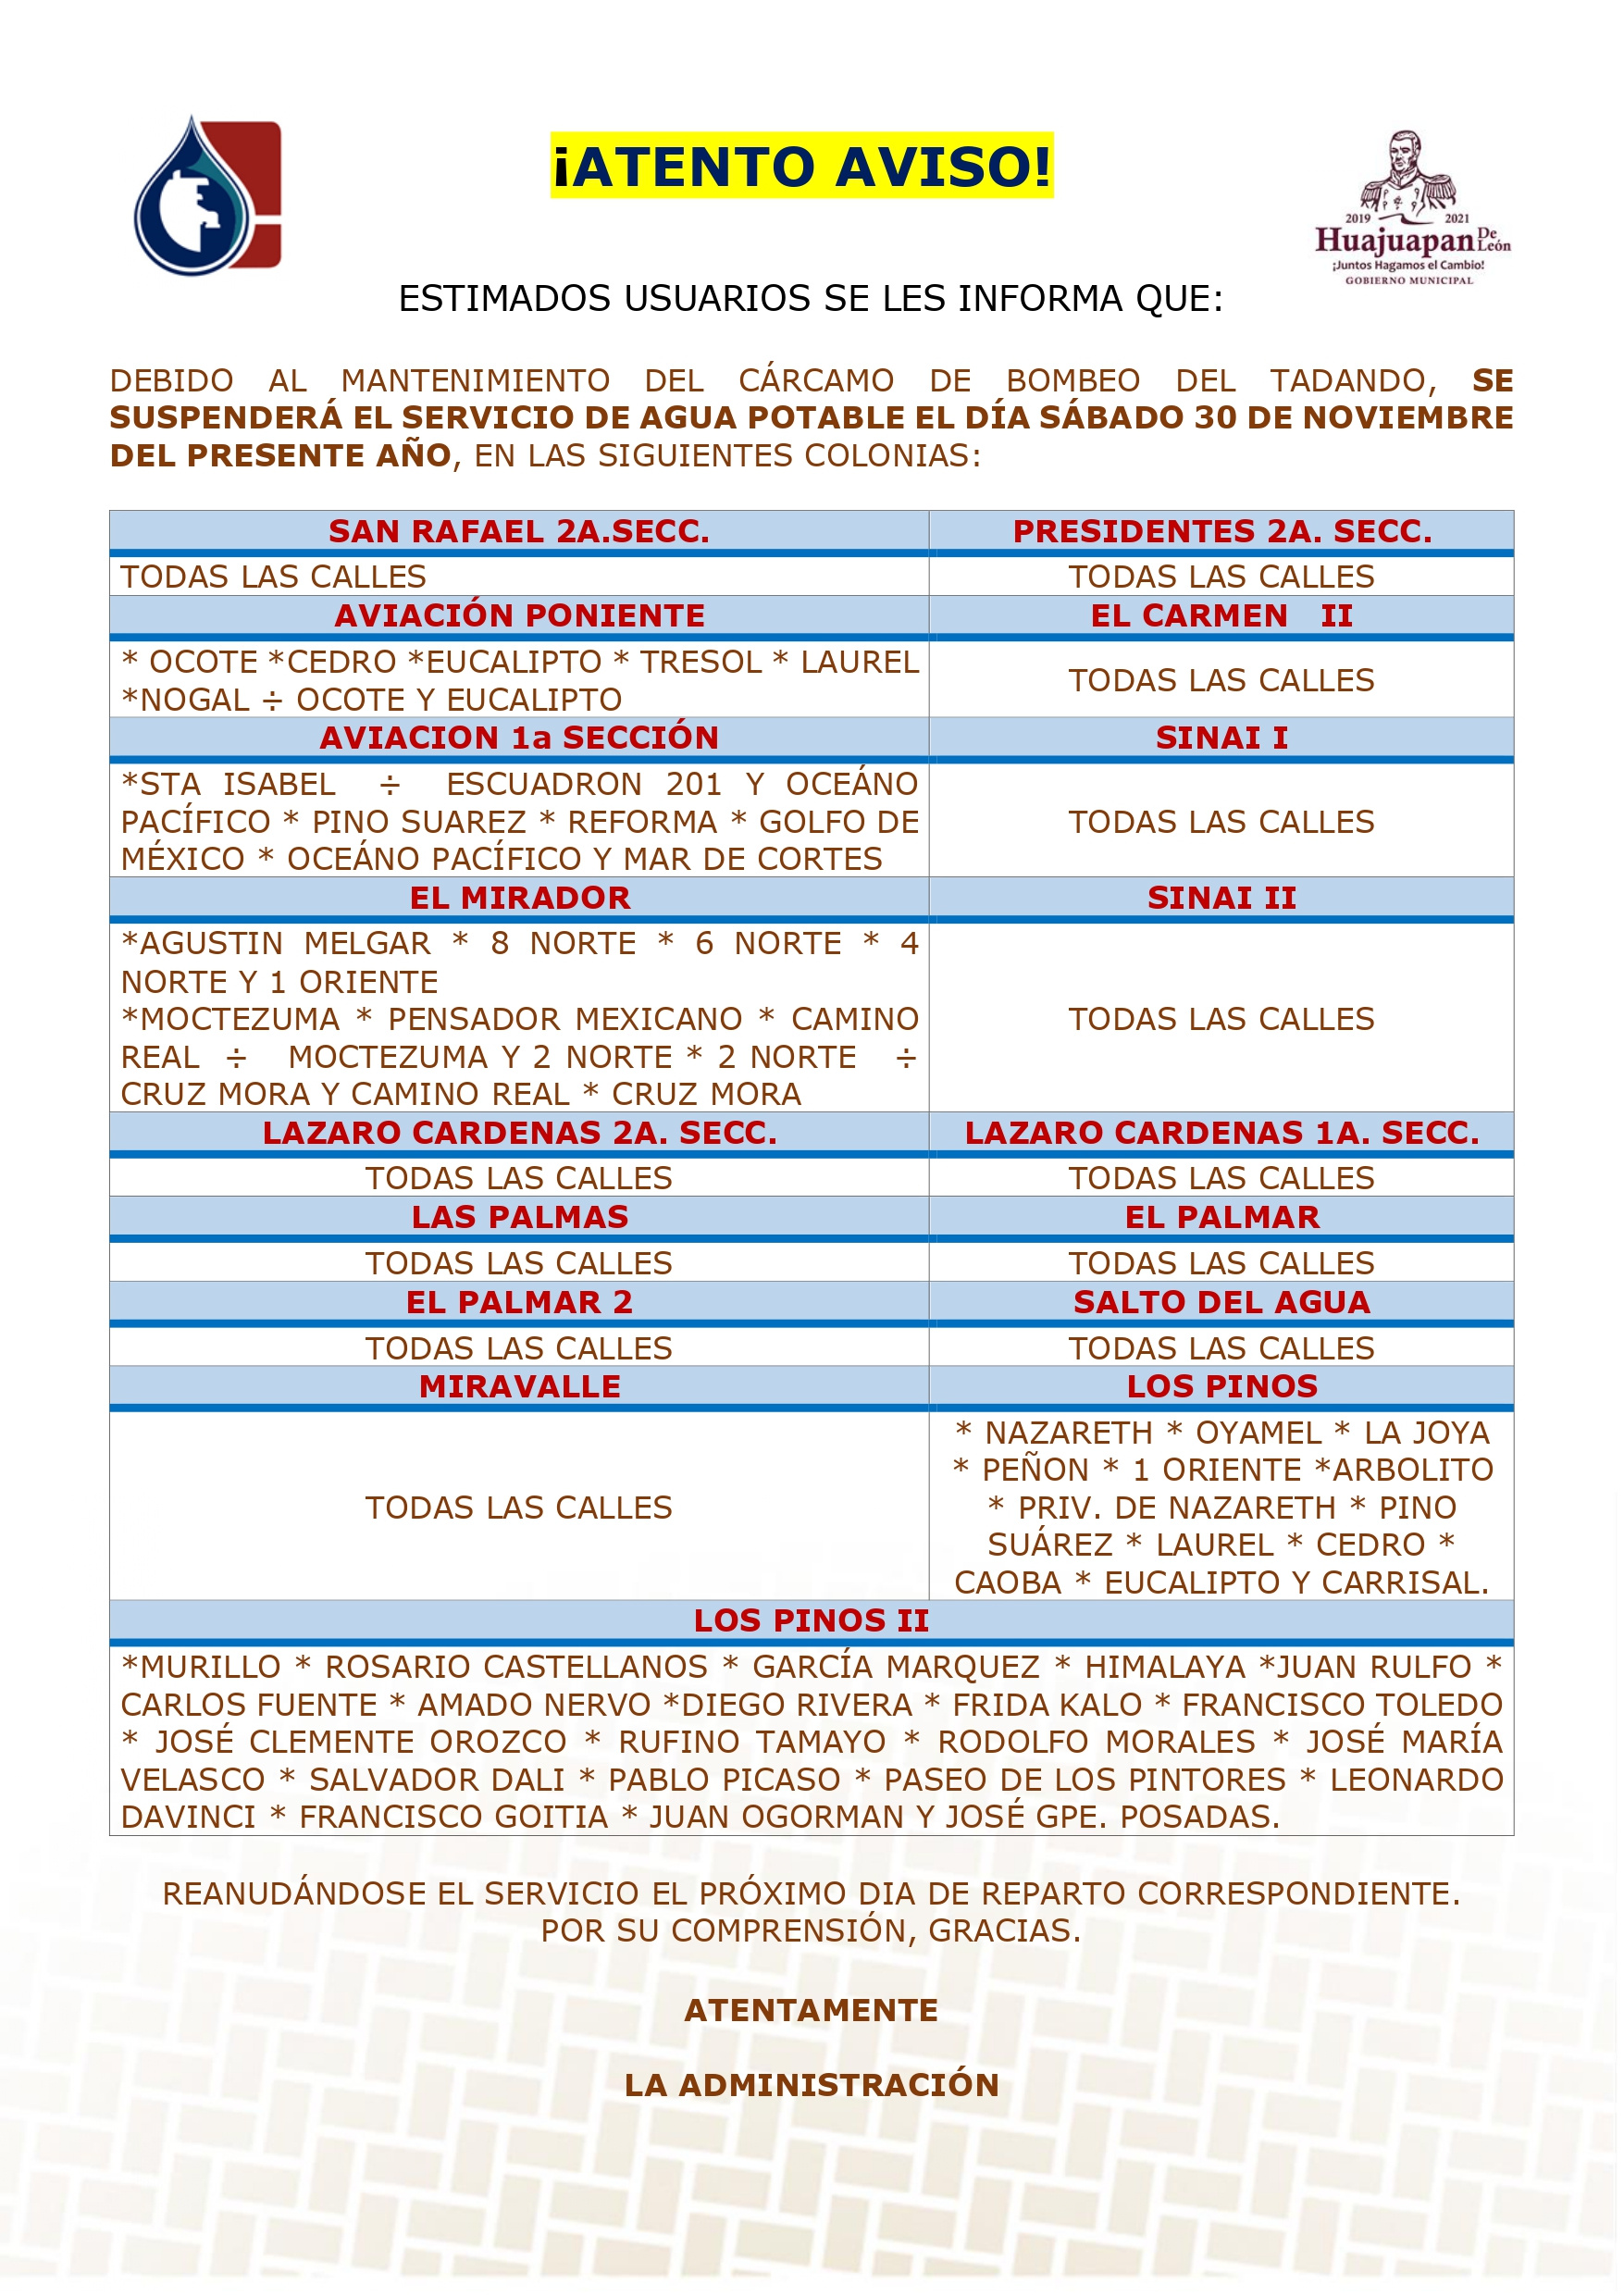 https://0201.nccdn.net/4_2/000/000/076/de9/aviso-caja-tadando-nov-19_page-0001-1755x2481.jpg